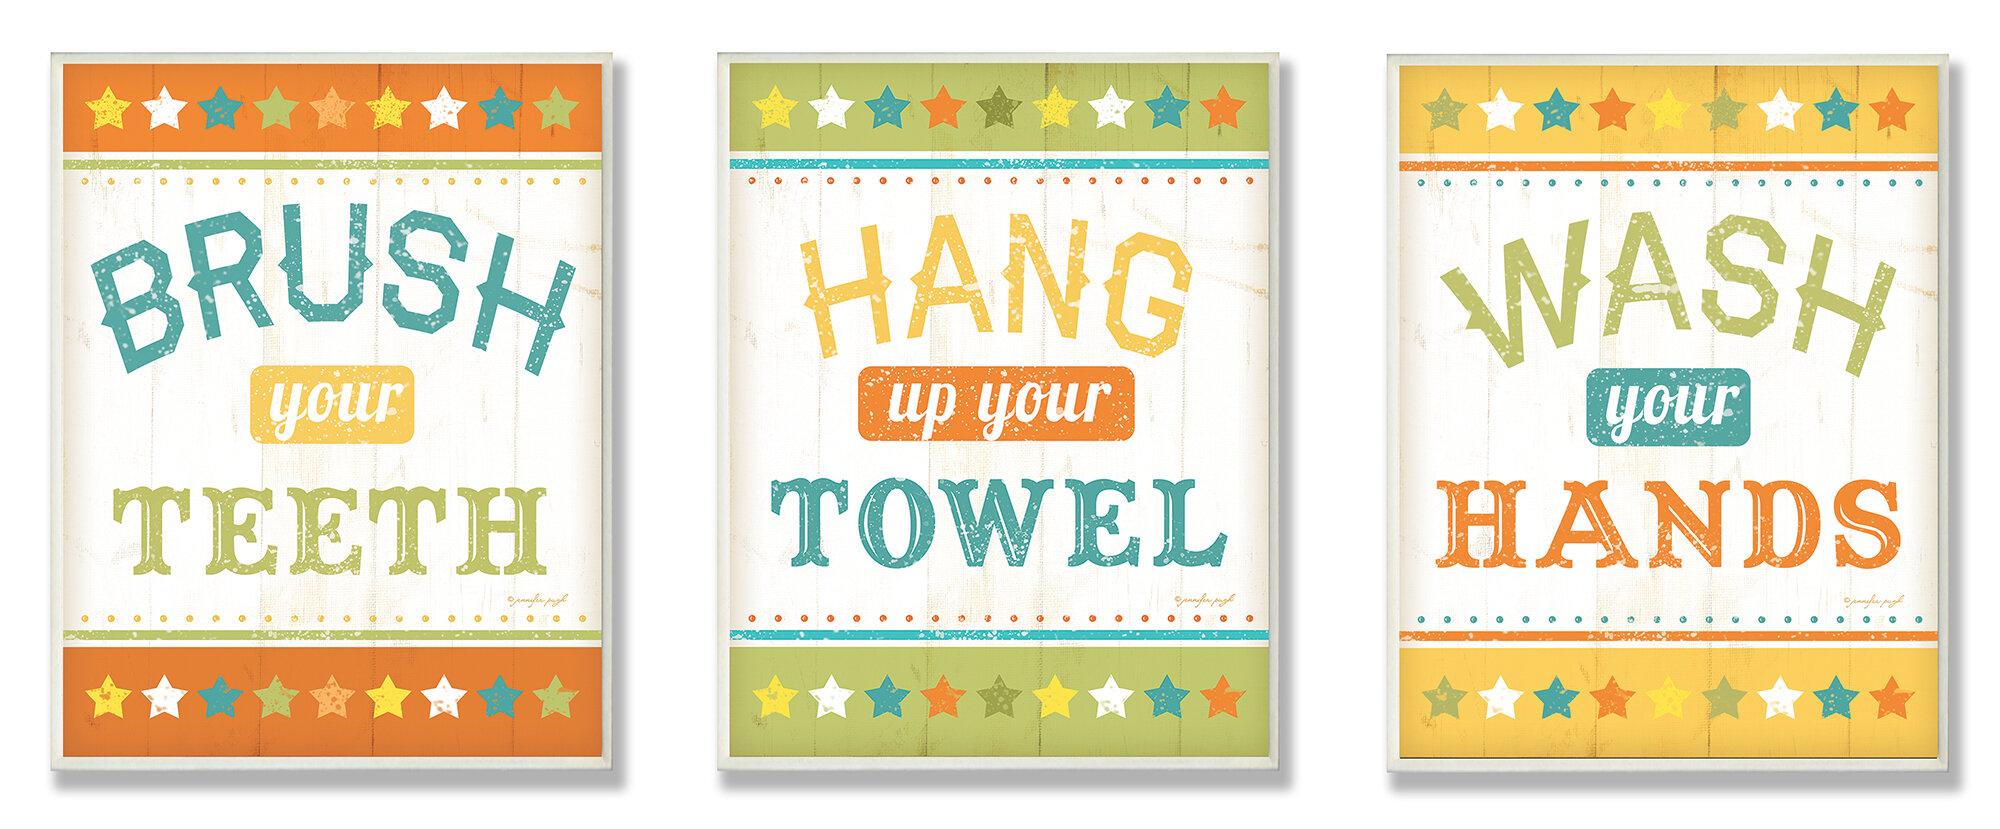 Zoomie Kids Kleckner Brush Your Teeth Hang Your Towel And Wash Your